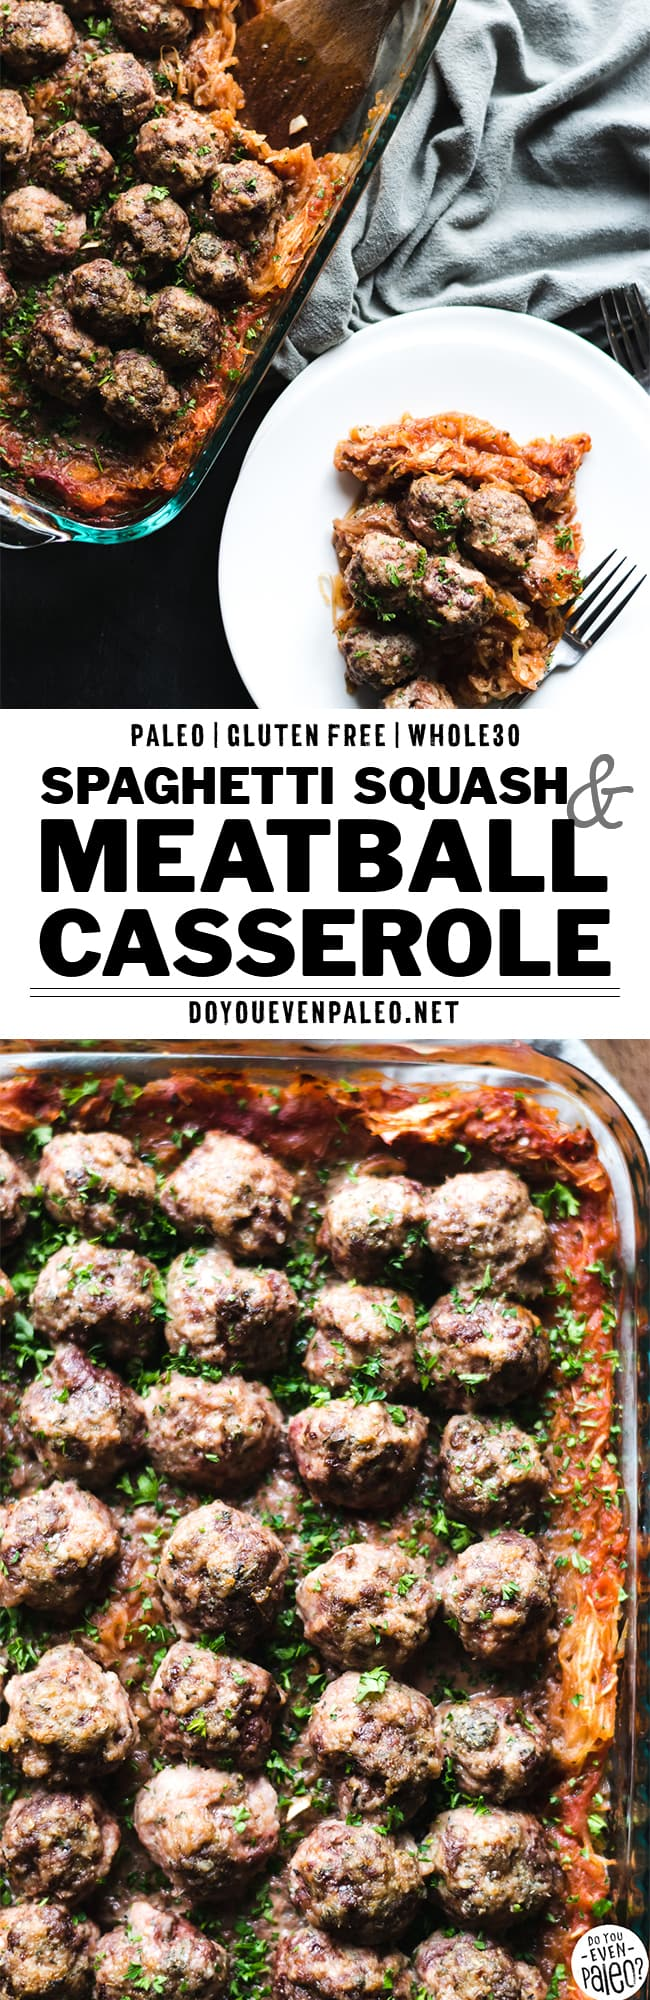 Paleo Spaghetti Squash & Meatball Casserole Recipe Pin | DoYouEvenPaleo.net